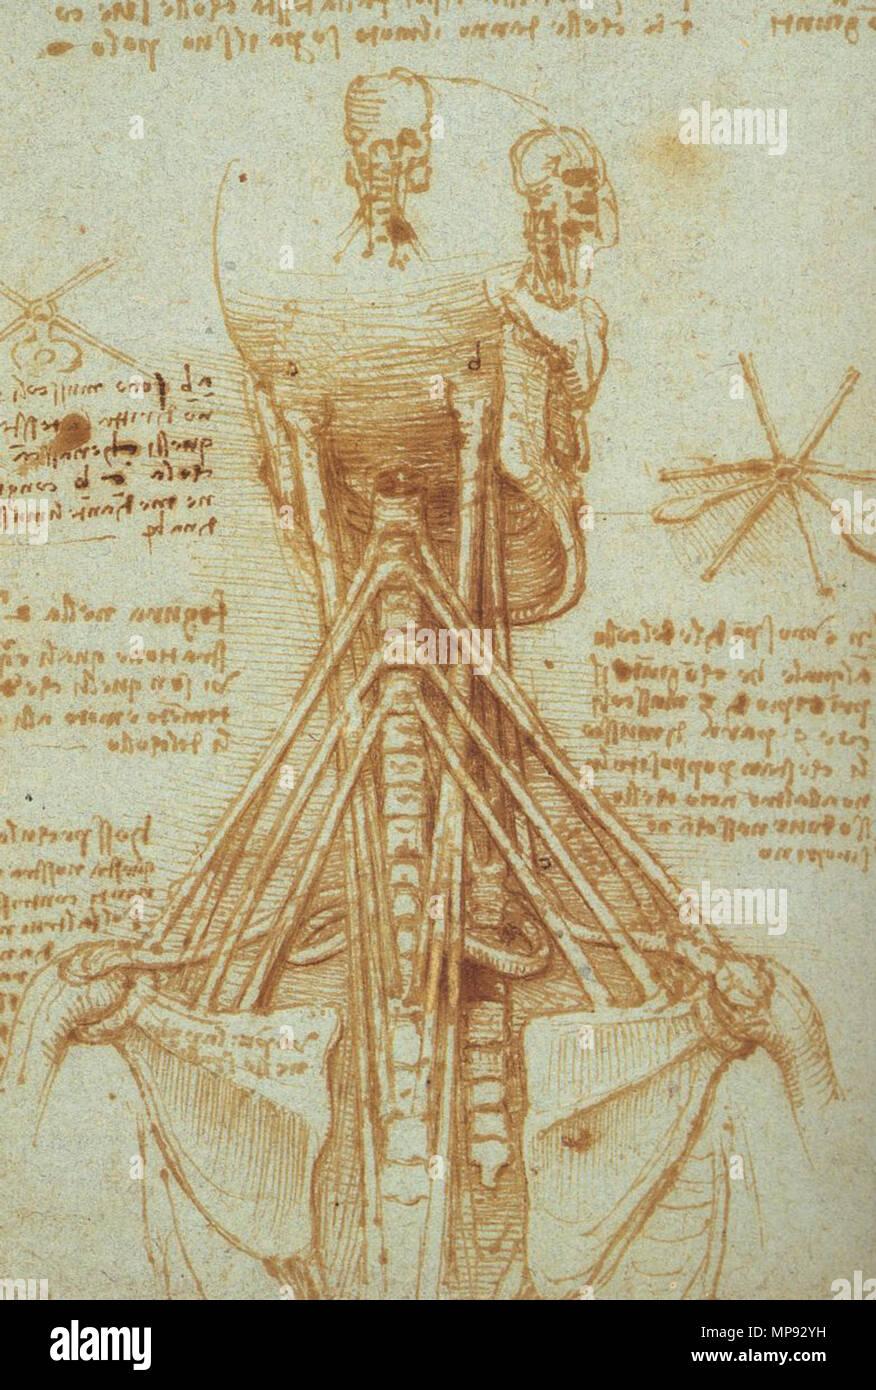 Anatomía de la garganta . circa 1515. Leonardo da Vinci (1452-1519 ...